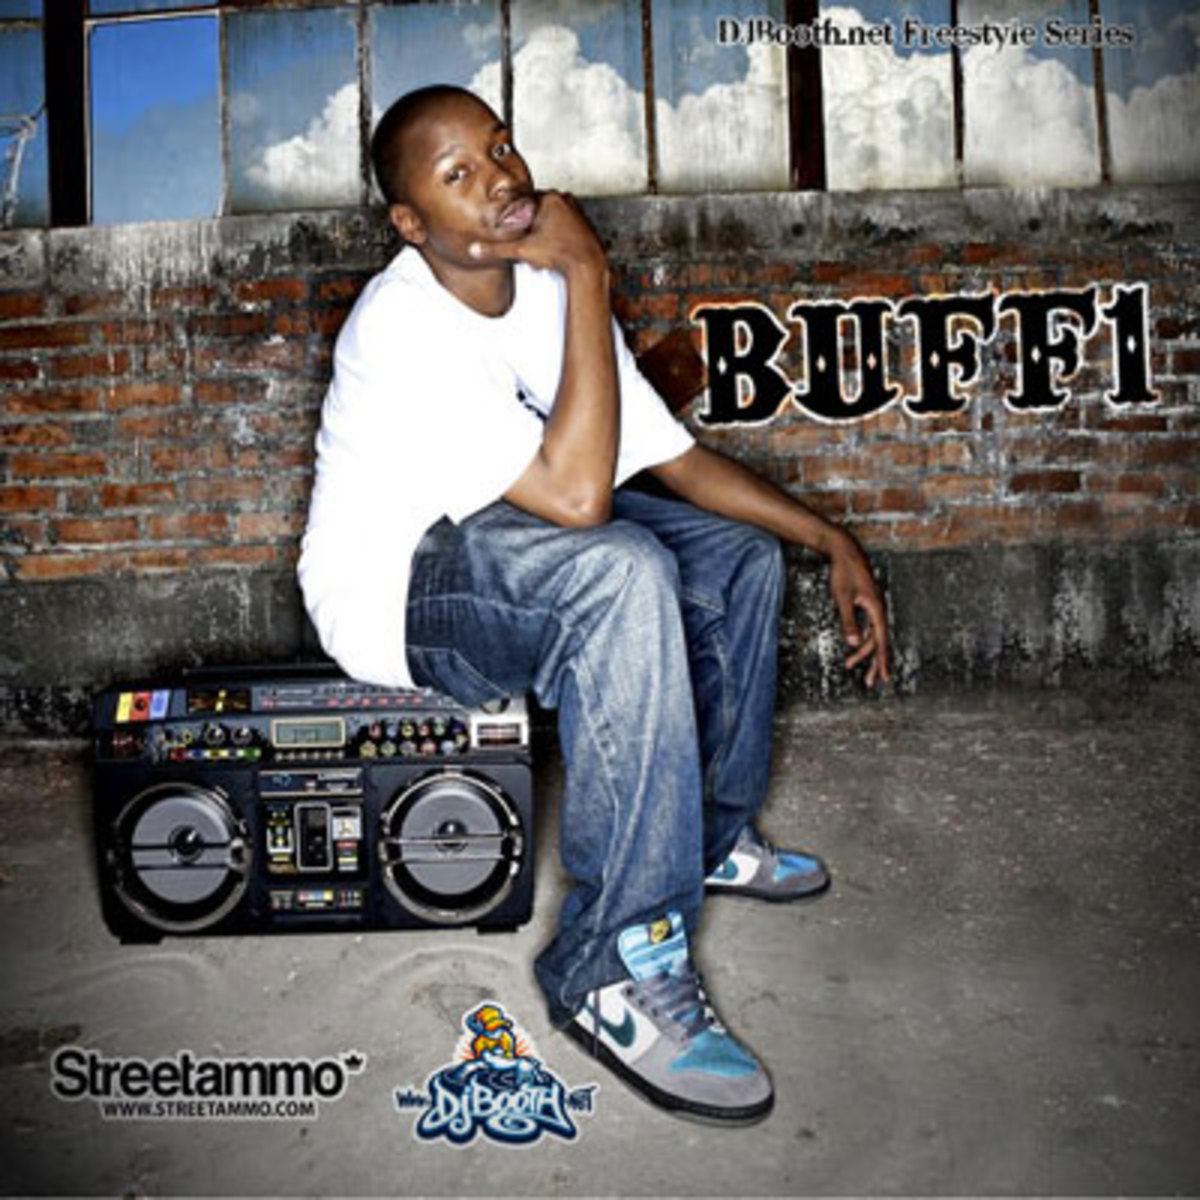 buff1-freestyle.jpg